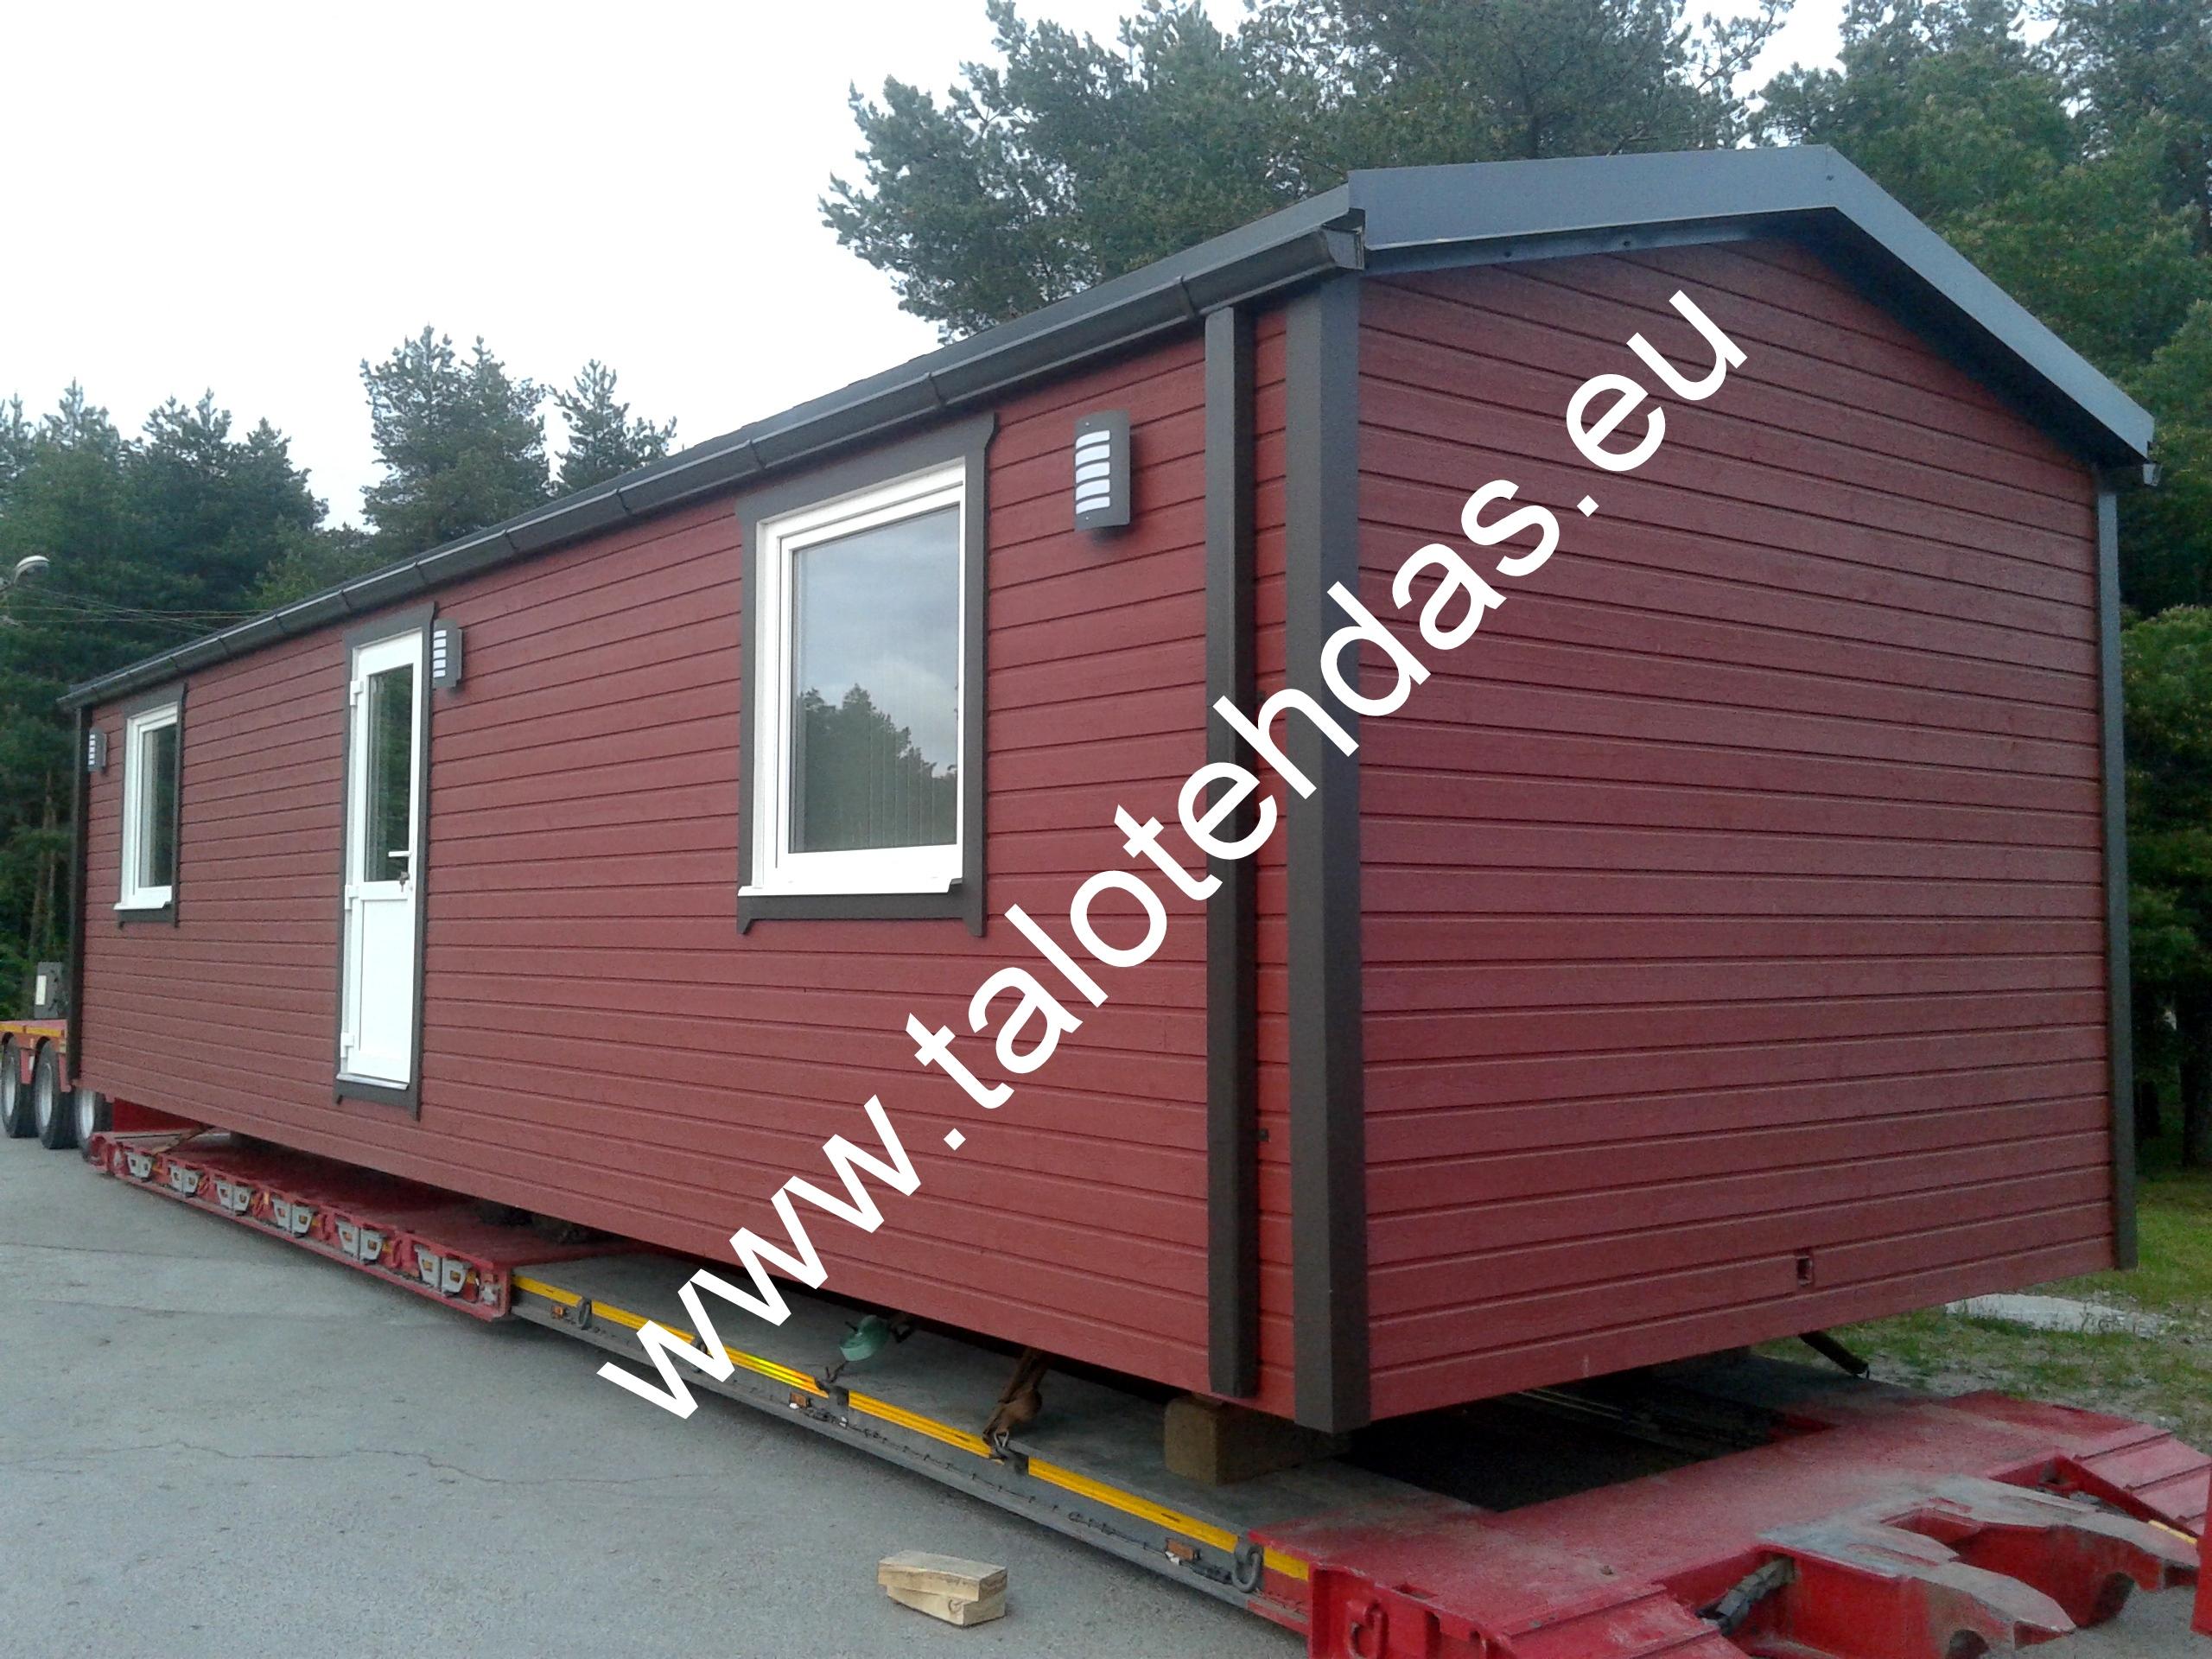 Talotehdas Virossa, talovaunut, elmenttitalo, tupla-leveä talovaunu, mobile home, static caravan